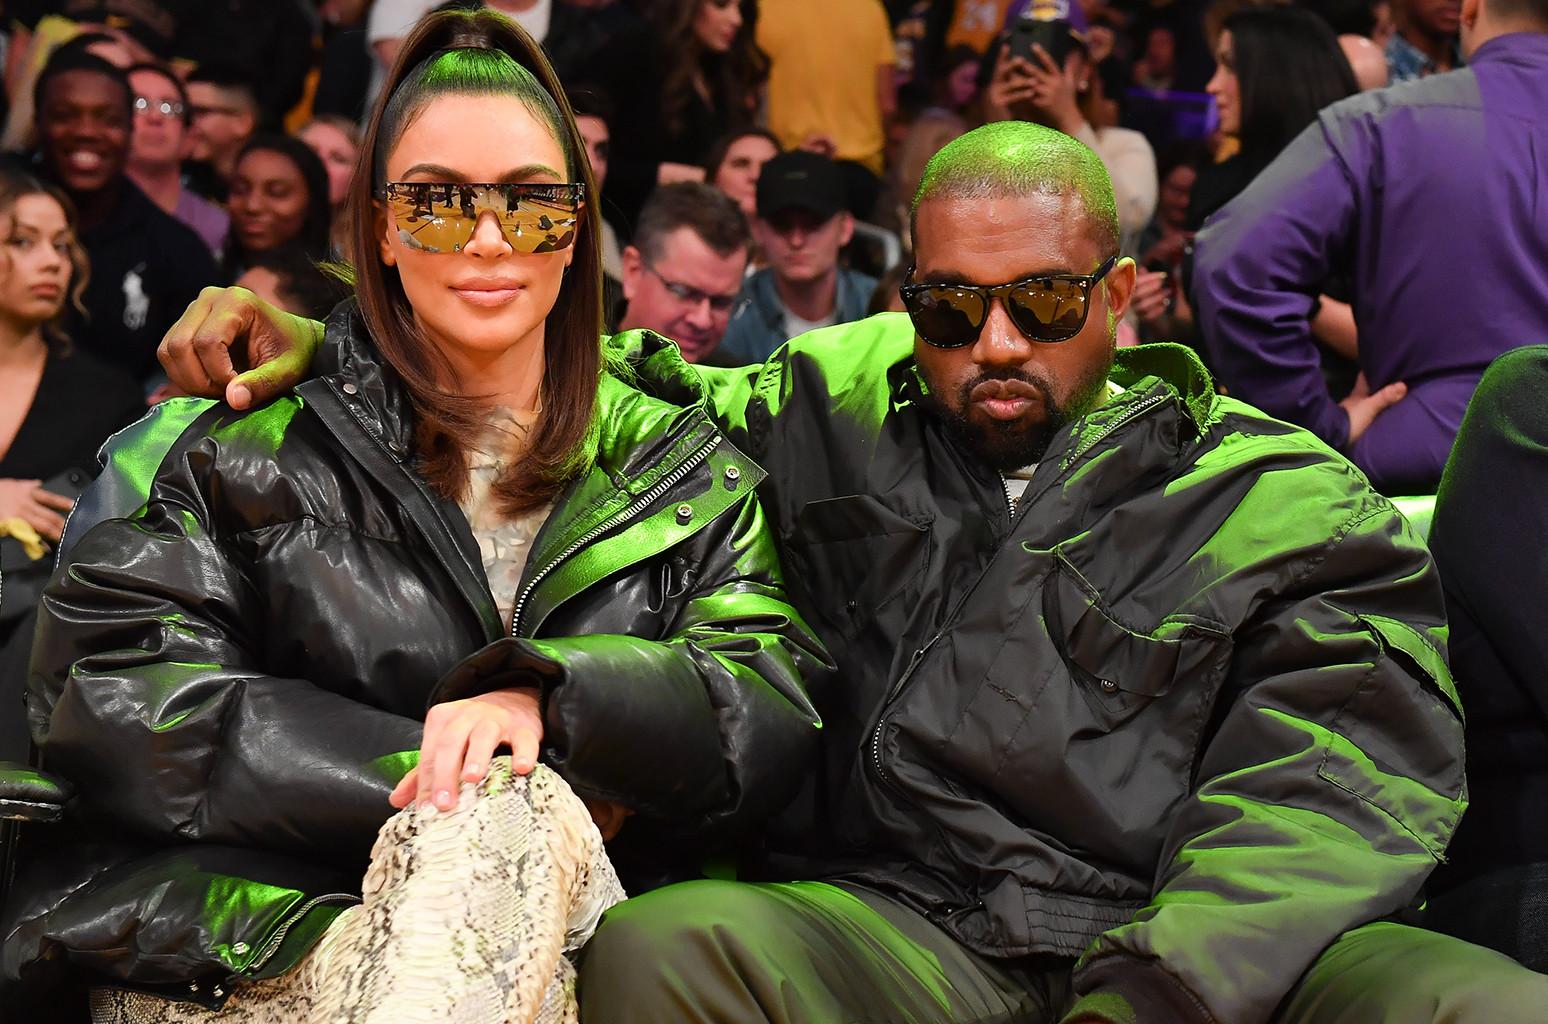 Peter Frampton Blasts Kim Kardashian's 'Insensitive' Birthday Post - Billboard